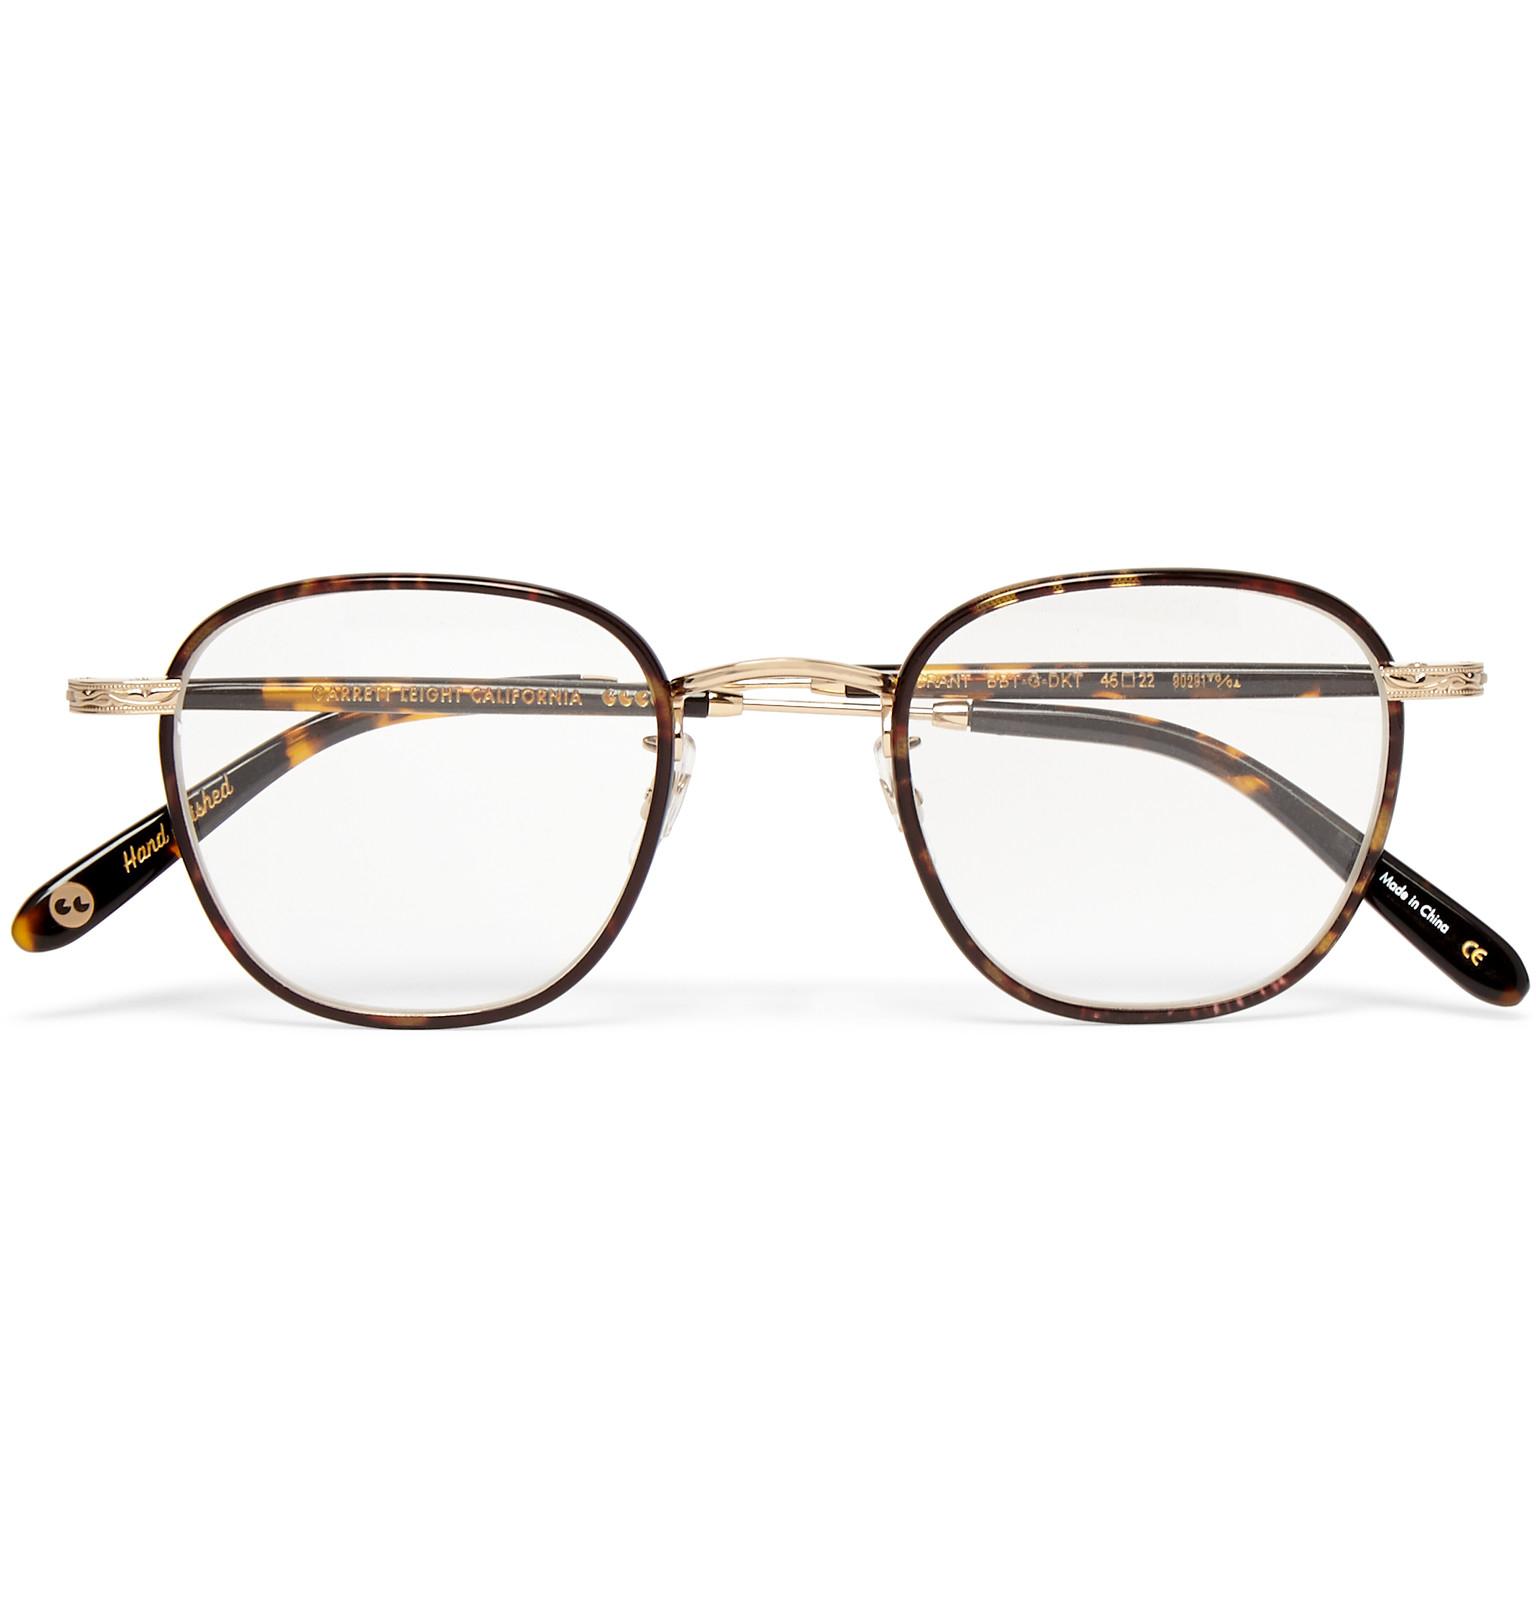 b55e6ea3f2 Lyst - Garrett Leight Grant Square-frame Acetate And Metal Optical Glasses  in Black for